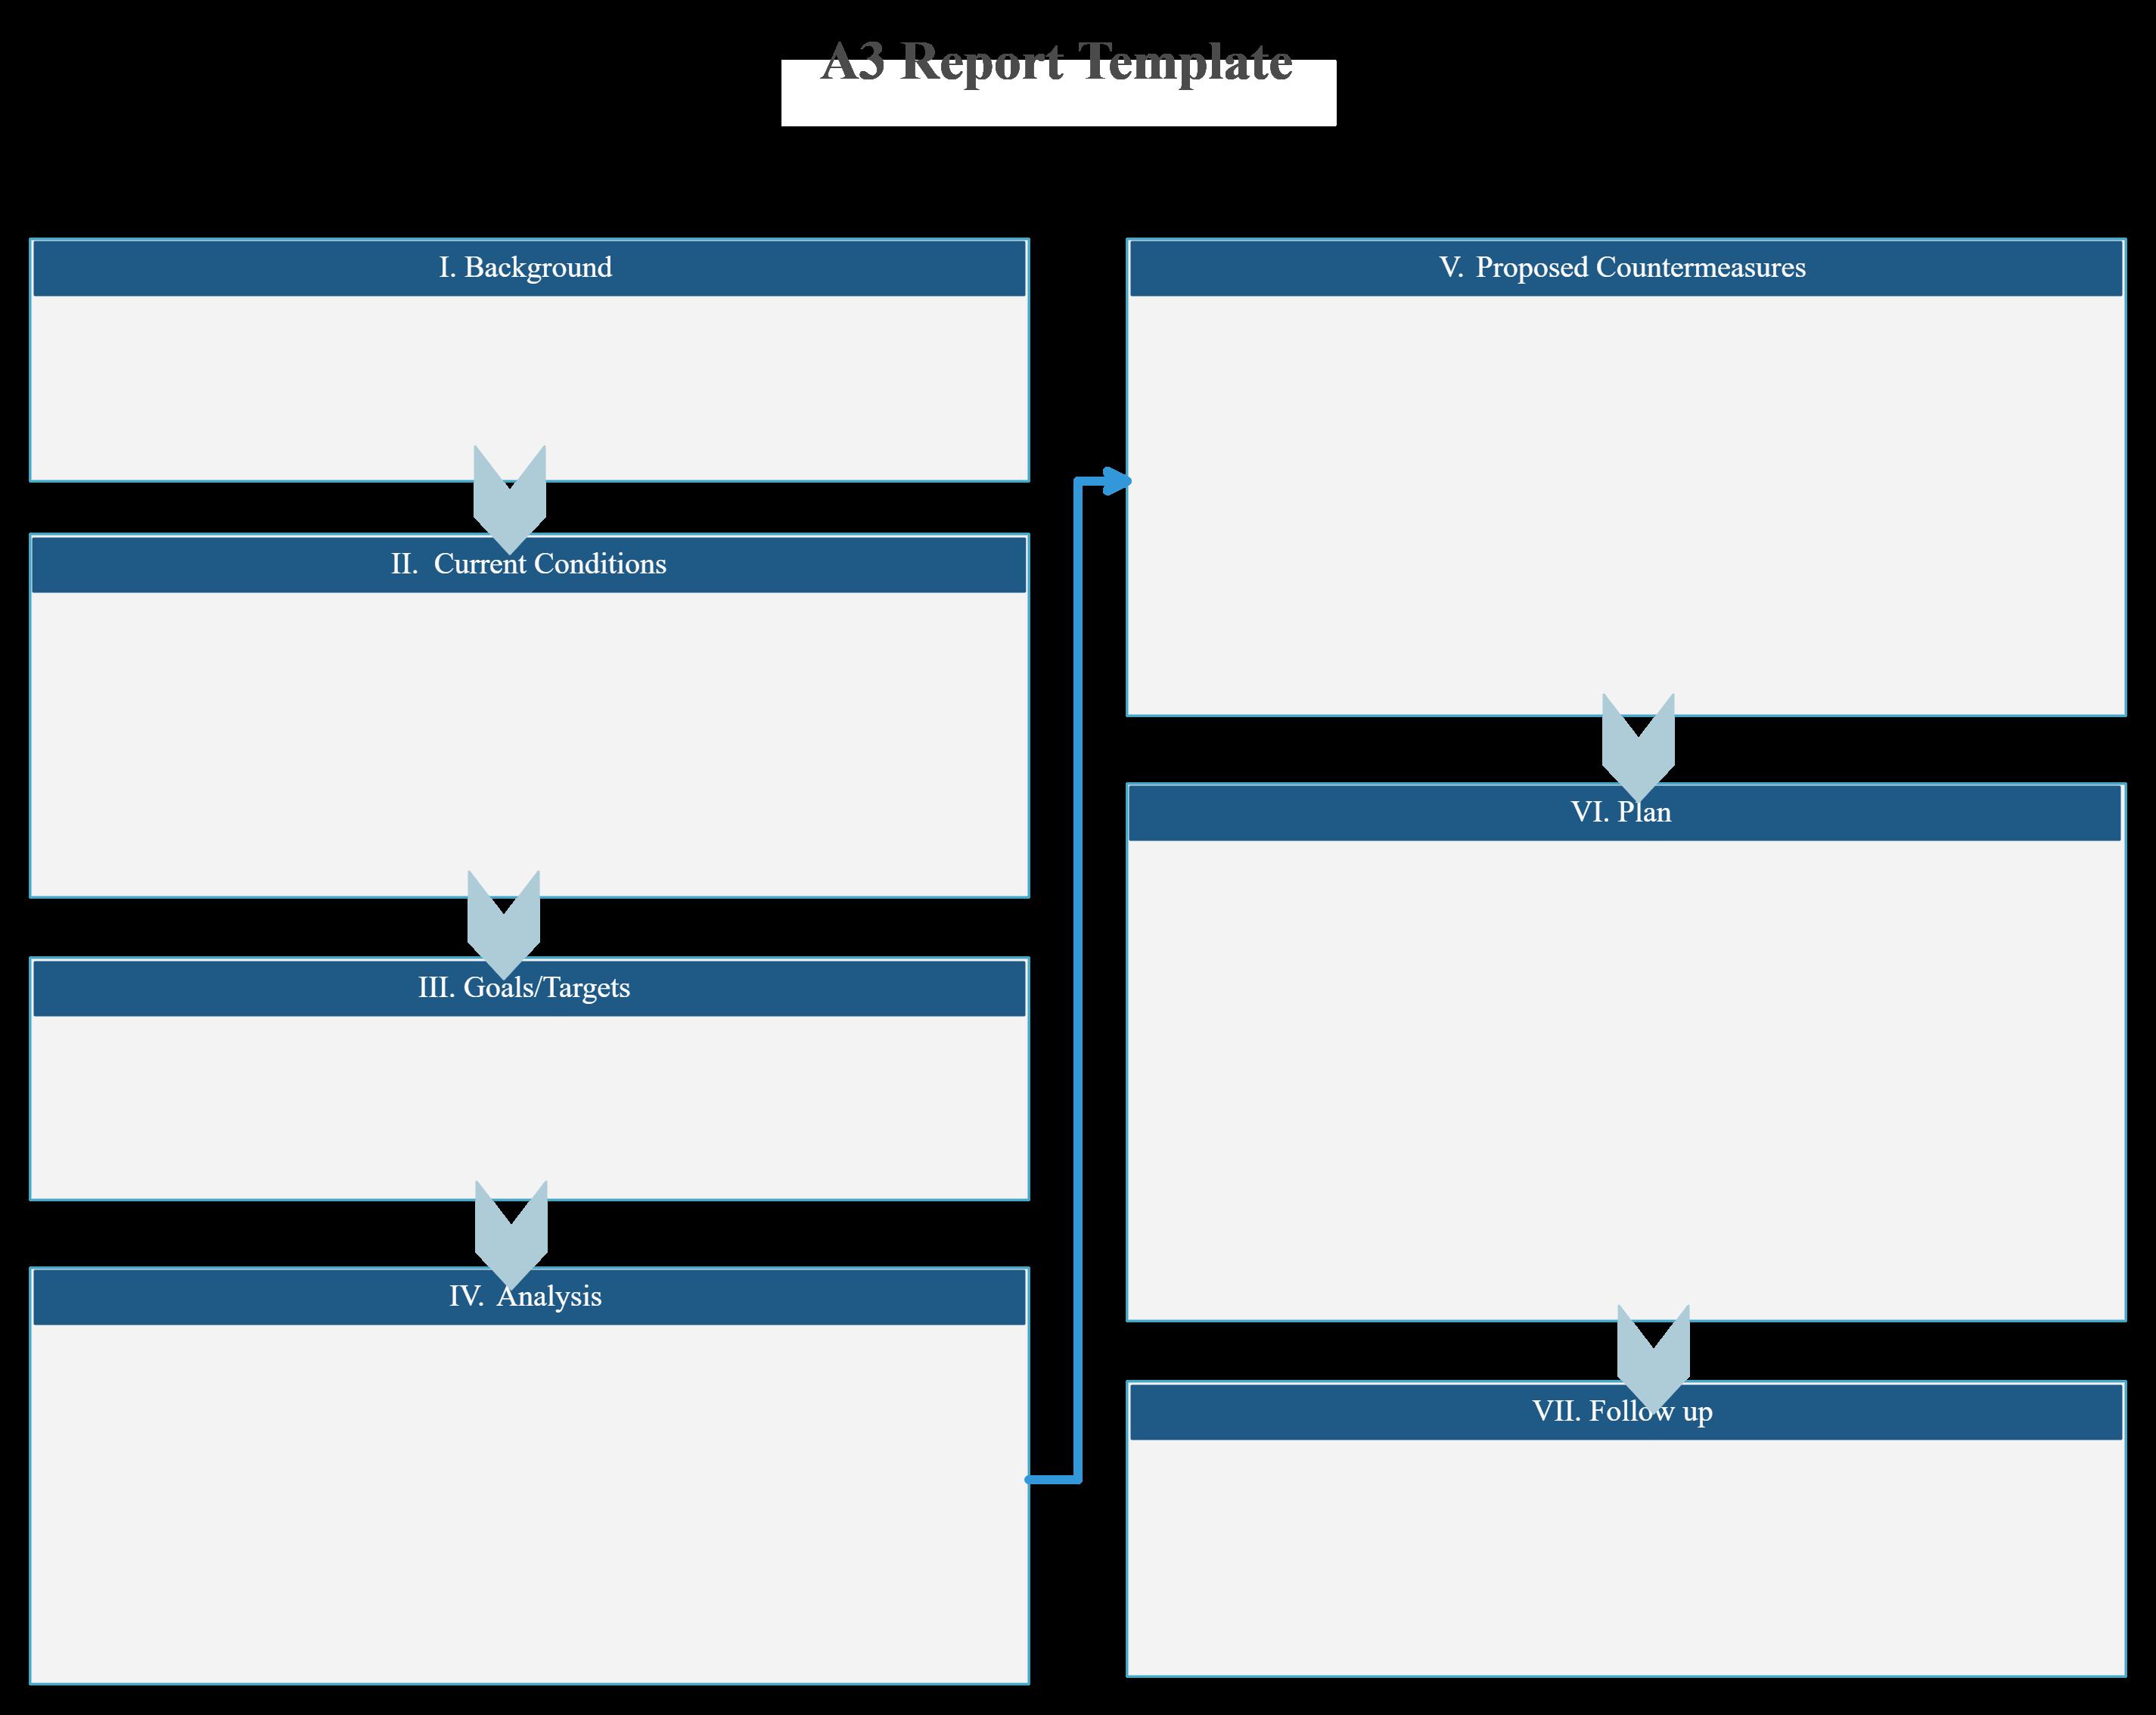 A3 Report Template Software Design Process Flow Diagram Electronics Design